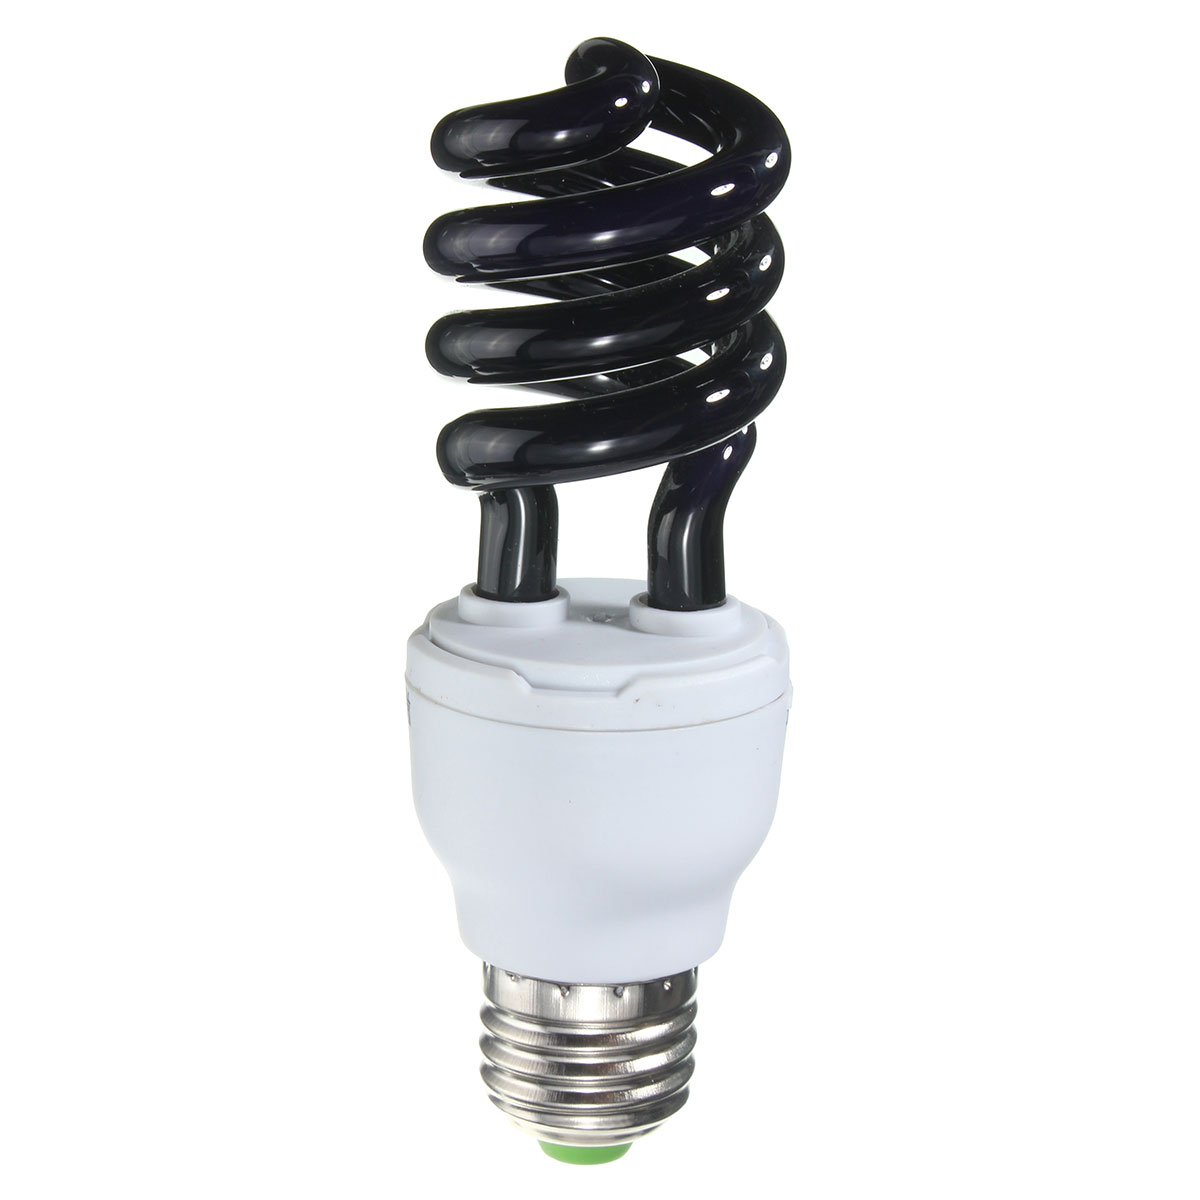 Uv Ultraviolet Spiral Low Energy Saving Cfl Light Bulb E27